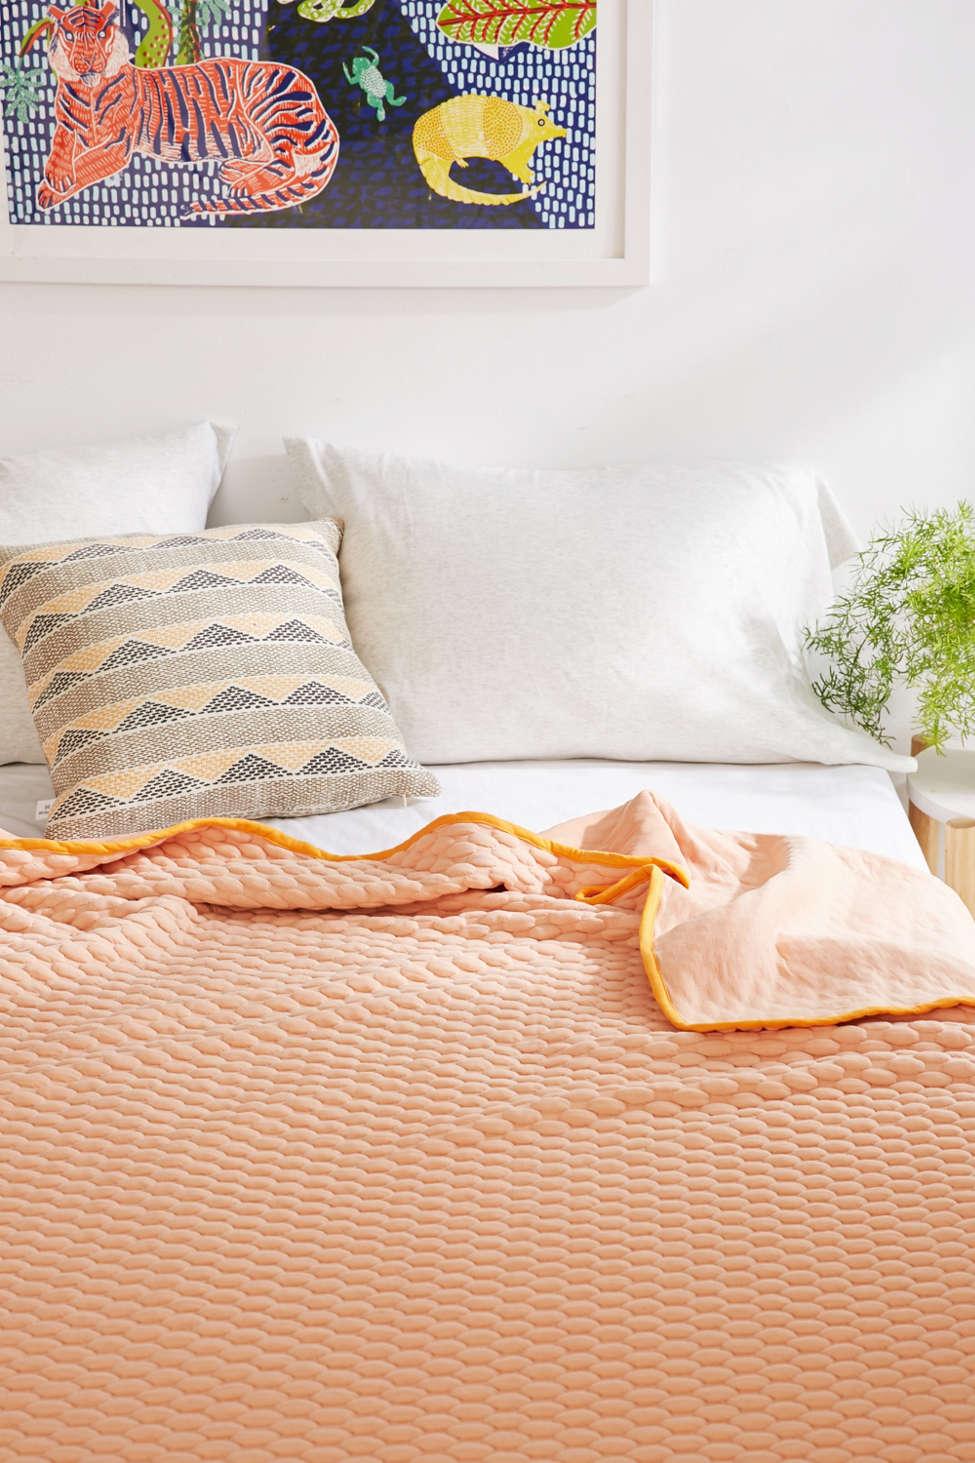 Slide View: 1: Marshmallow Bed Blanket